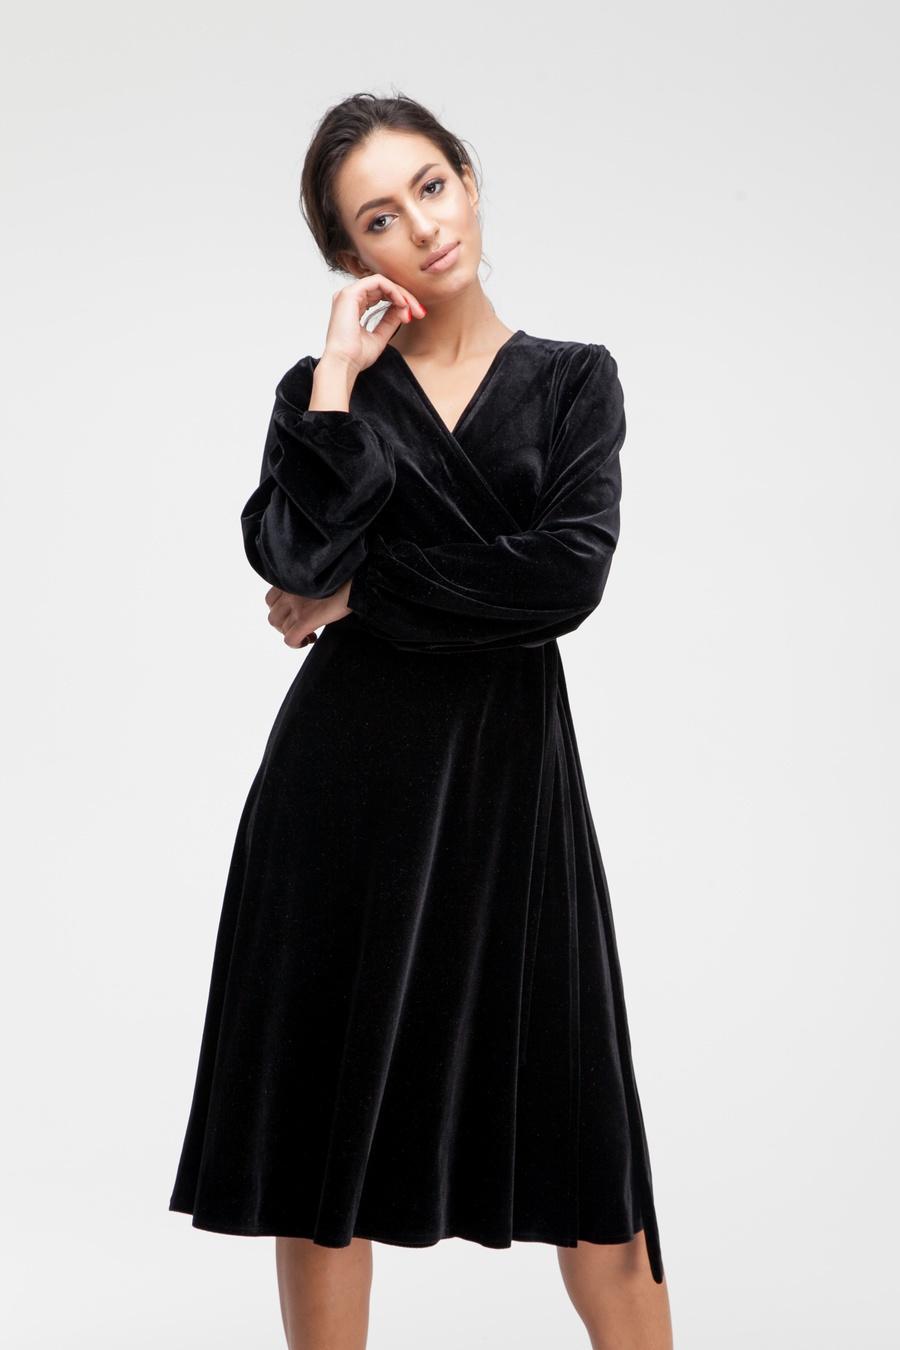 Платье миди на запах из бархата черное - THE LACE